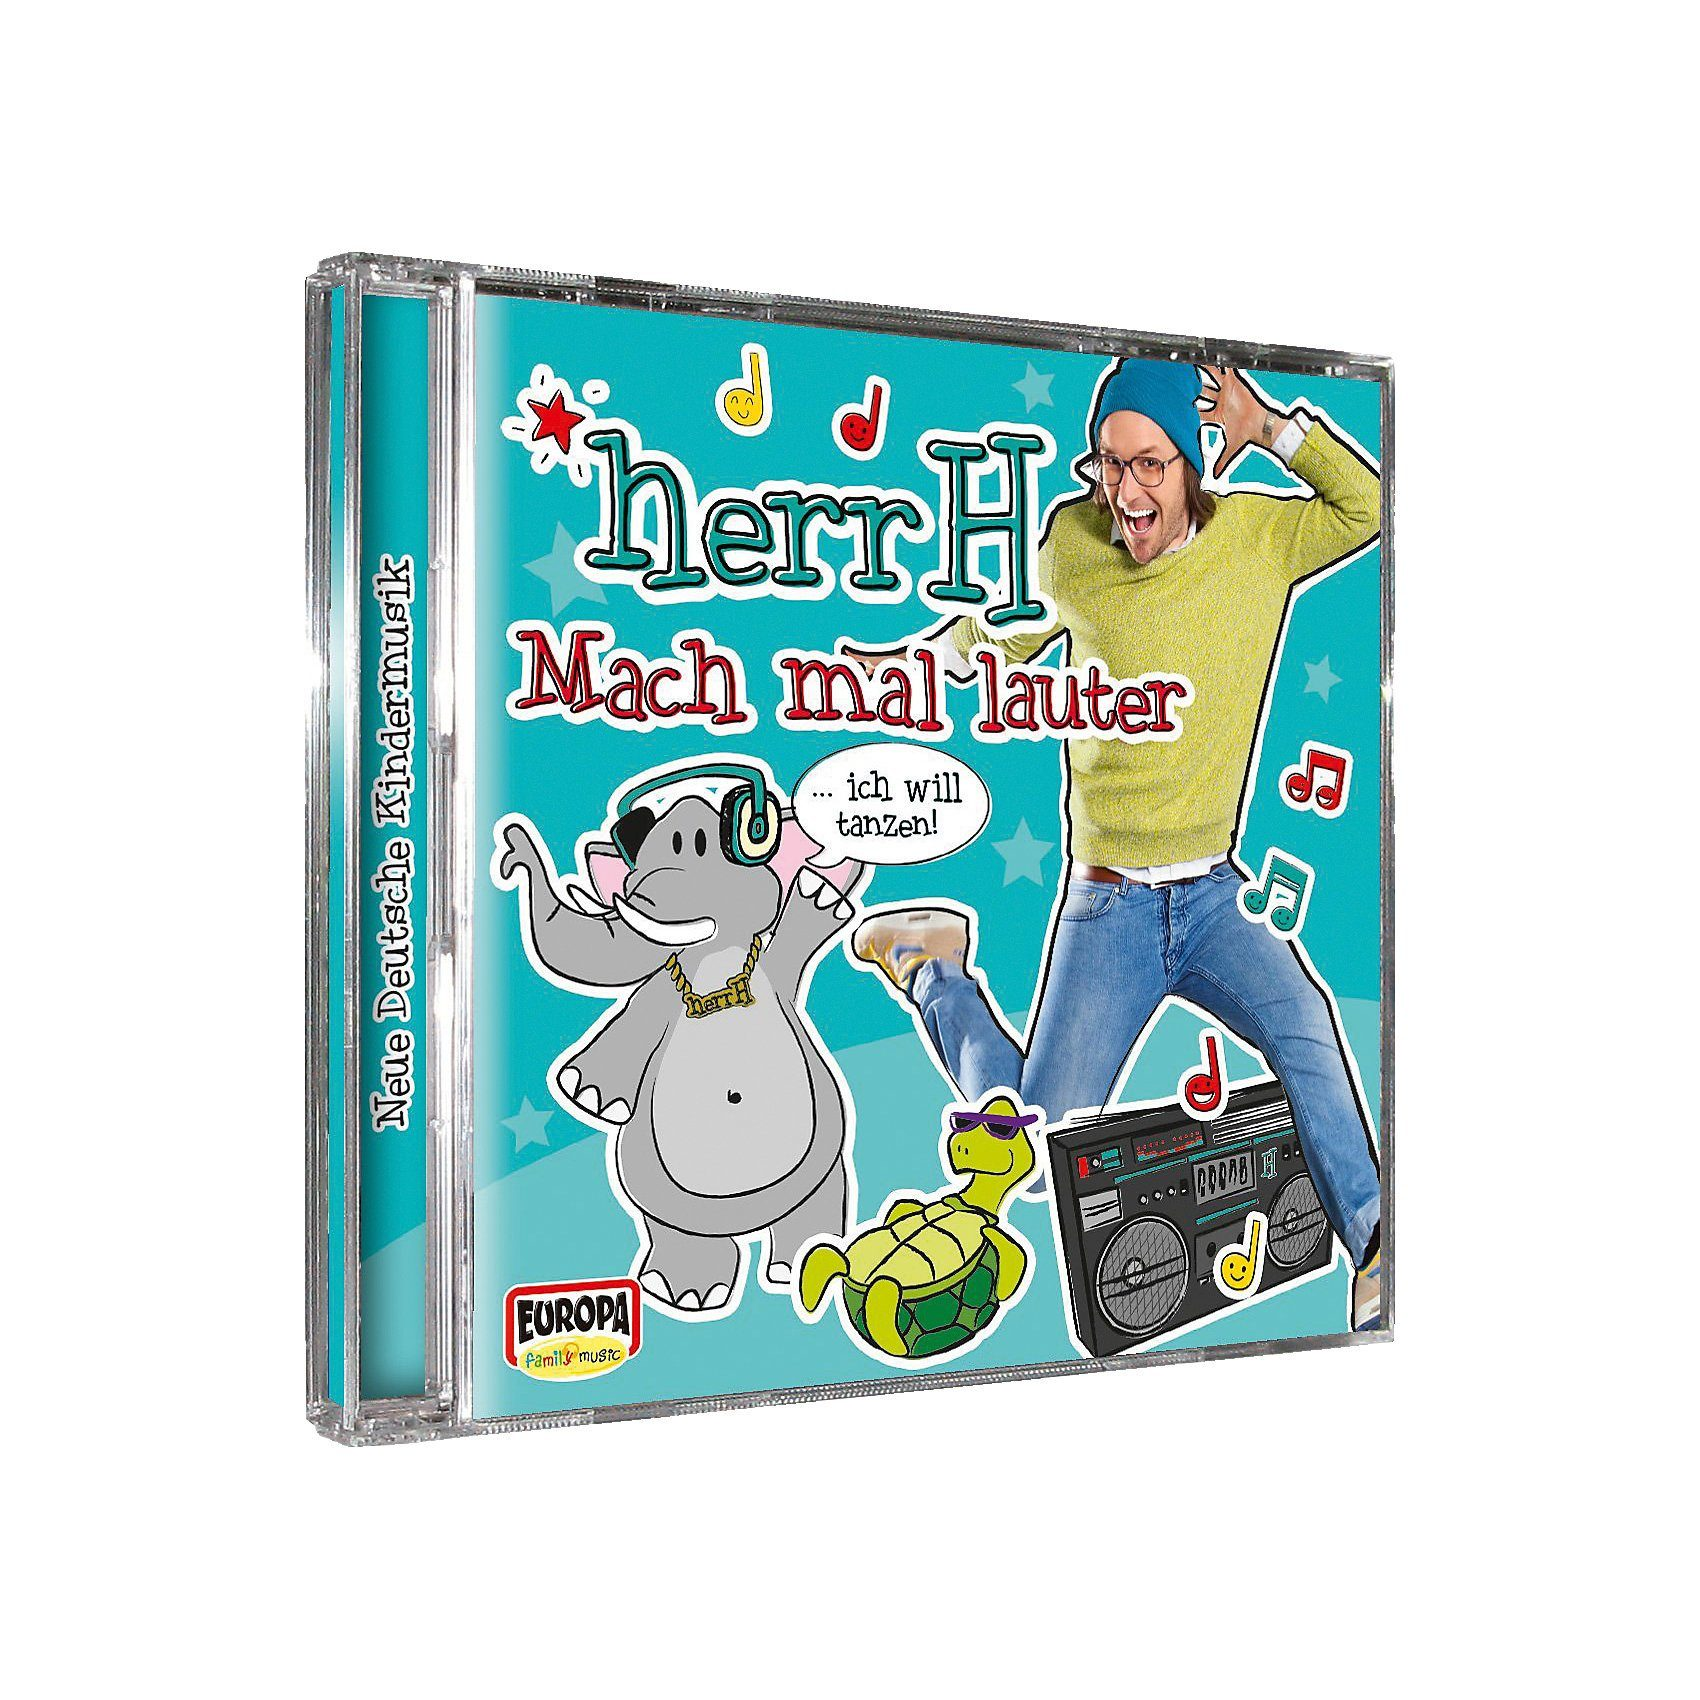 Sony CD herrH - Mach mal lauter